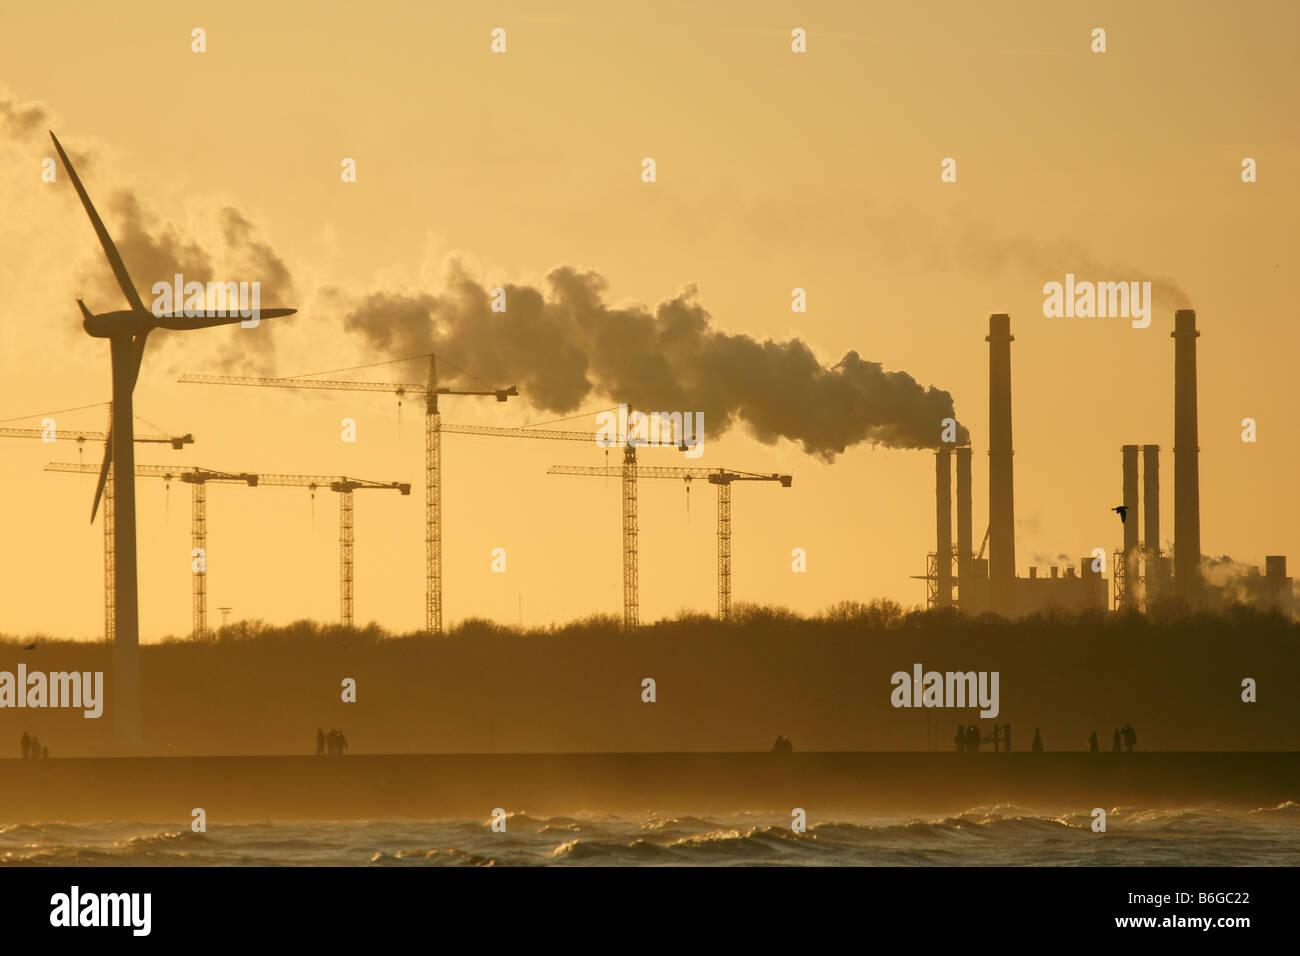 Wind turbine cranes industrial factory chimneys pink sky smoke plume pollution sky Hoek van Holland Netherlands - Stock Image